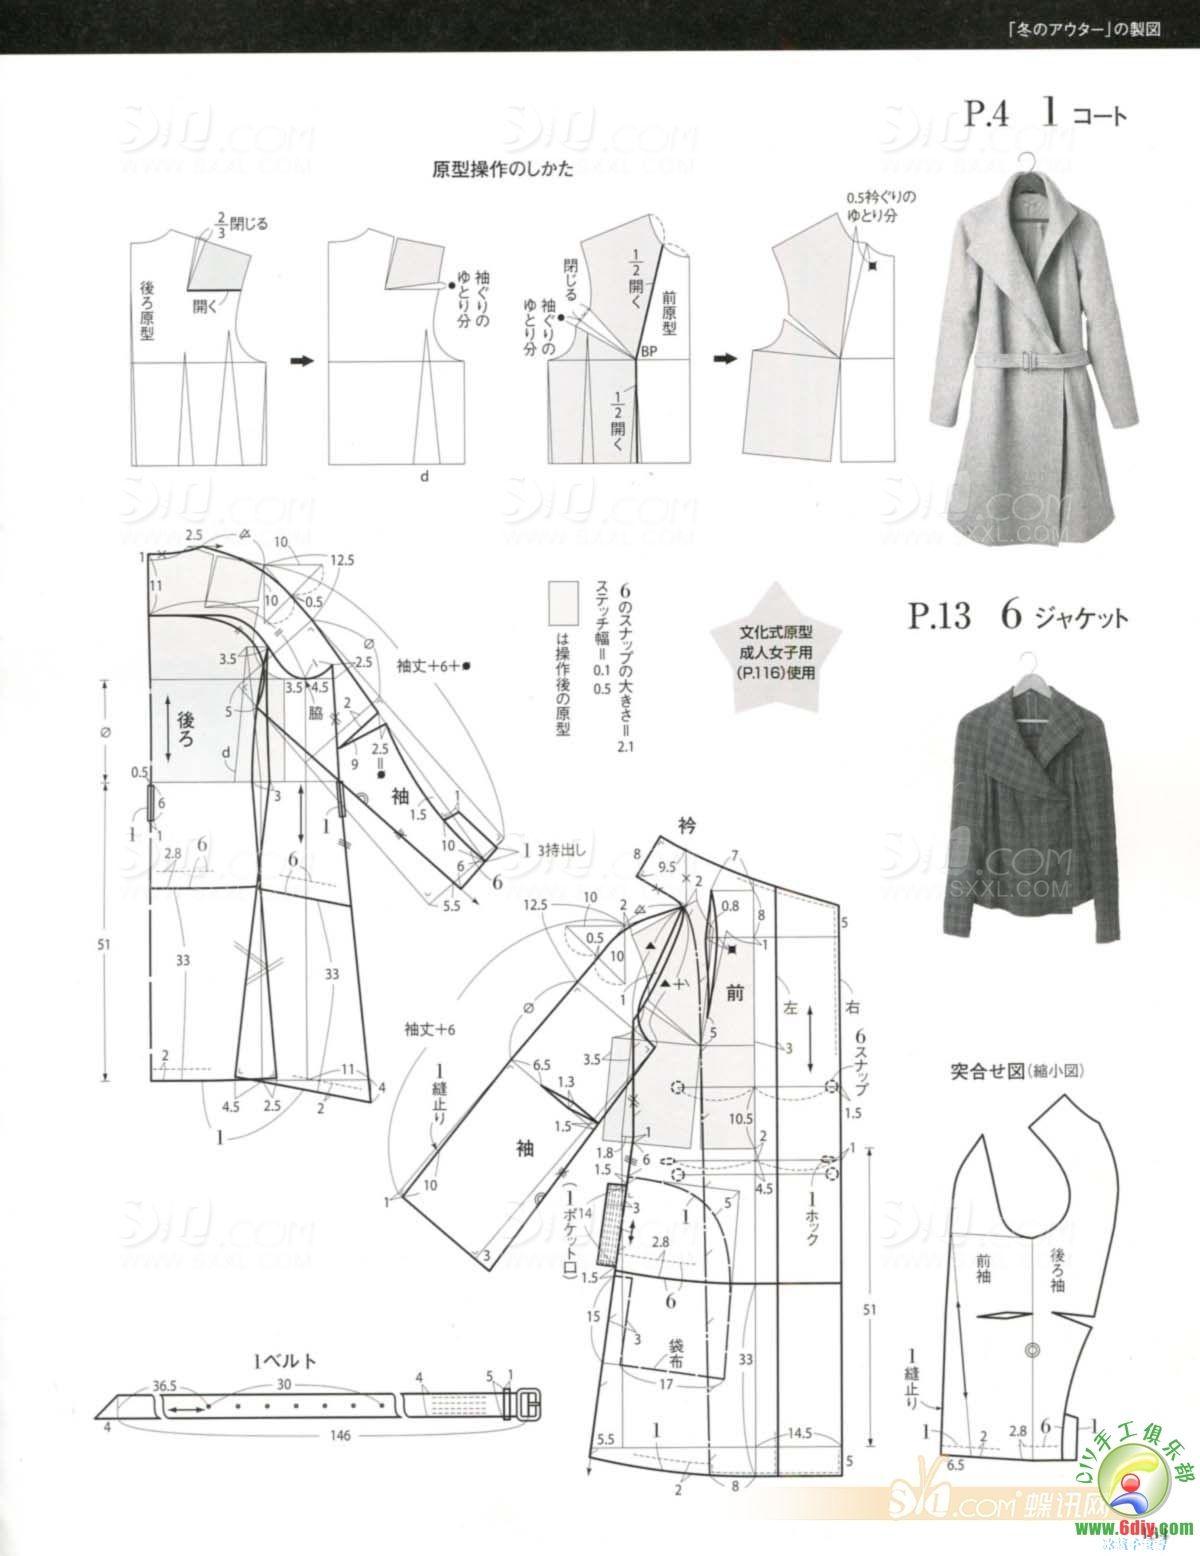 Pin de Luisa Echeverri en PATRONES | Pinterest | Patrones, Costura y ...